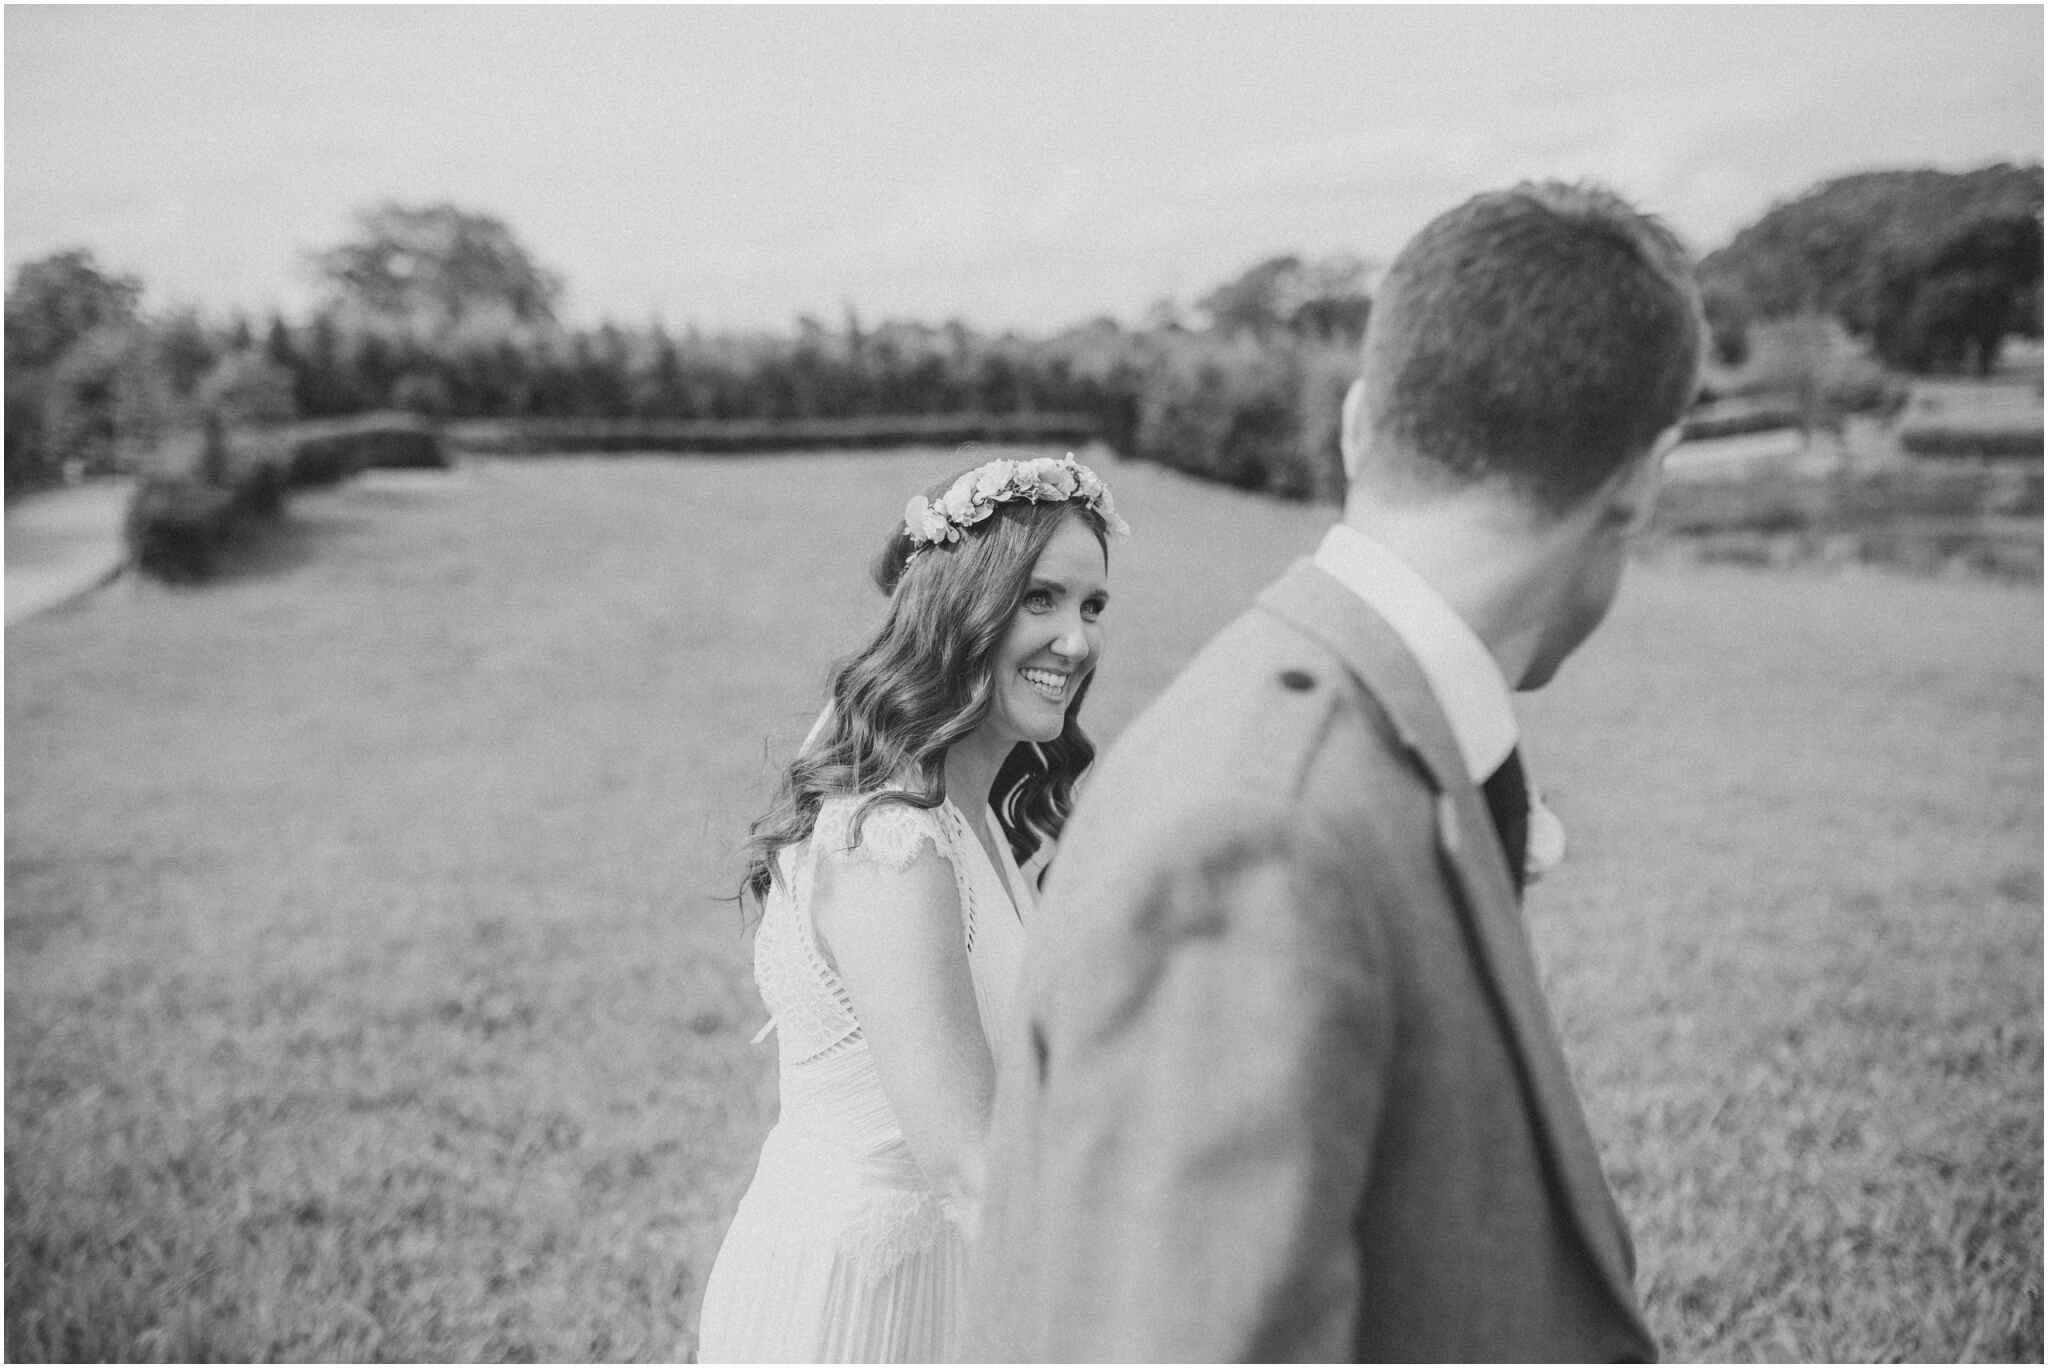 Fionnuala + Paul - Mount Druid Alternative Wedding 126